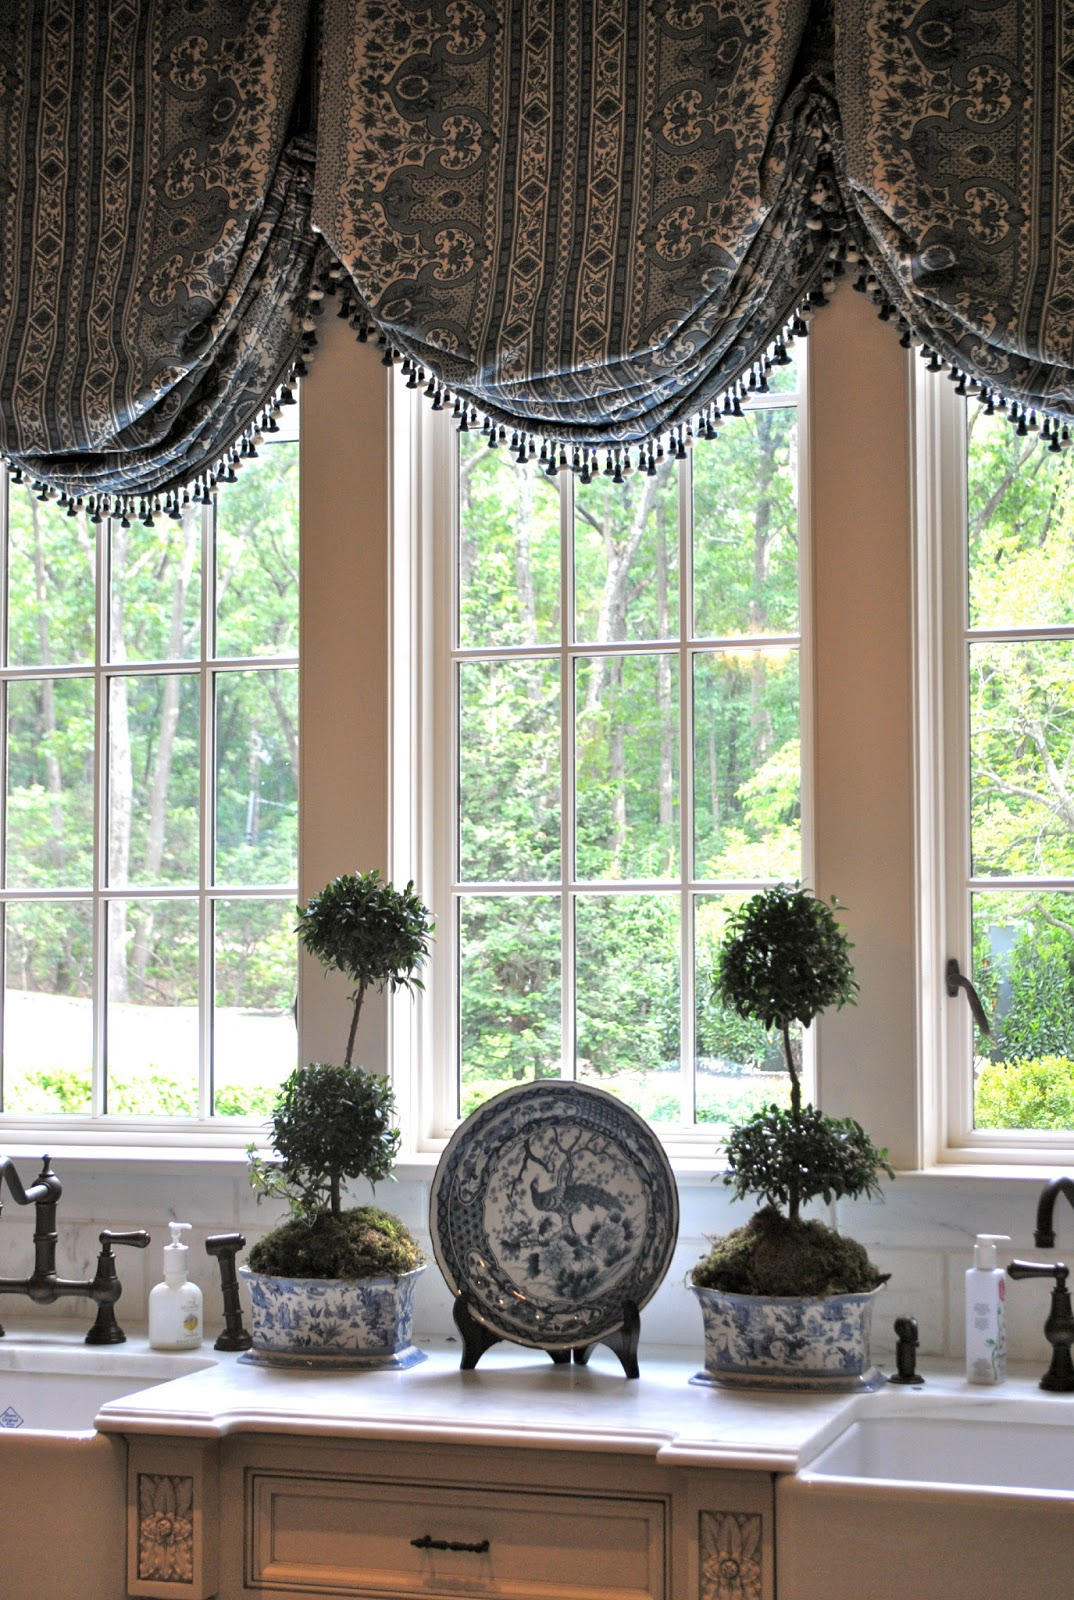 Kitchen Window Treatment Drawer Liners Random Weekend Musings Home Interior Design Ideas